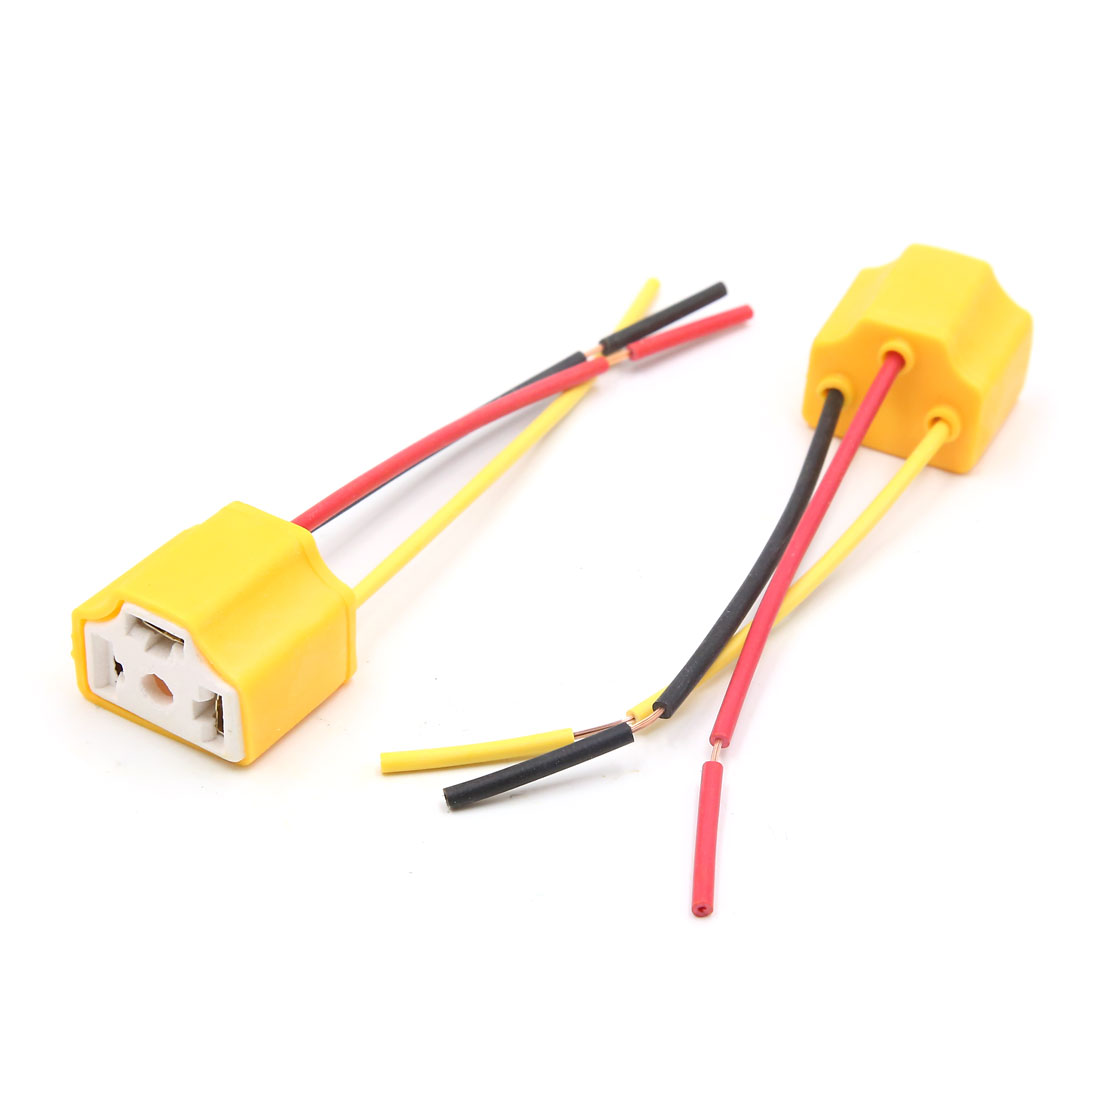 20Pcs H4 Ceramic 3 Wires Harness Socket Car Fog Light Bulb Extension Connector - image 1 of 3